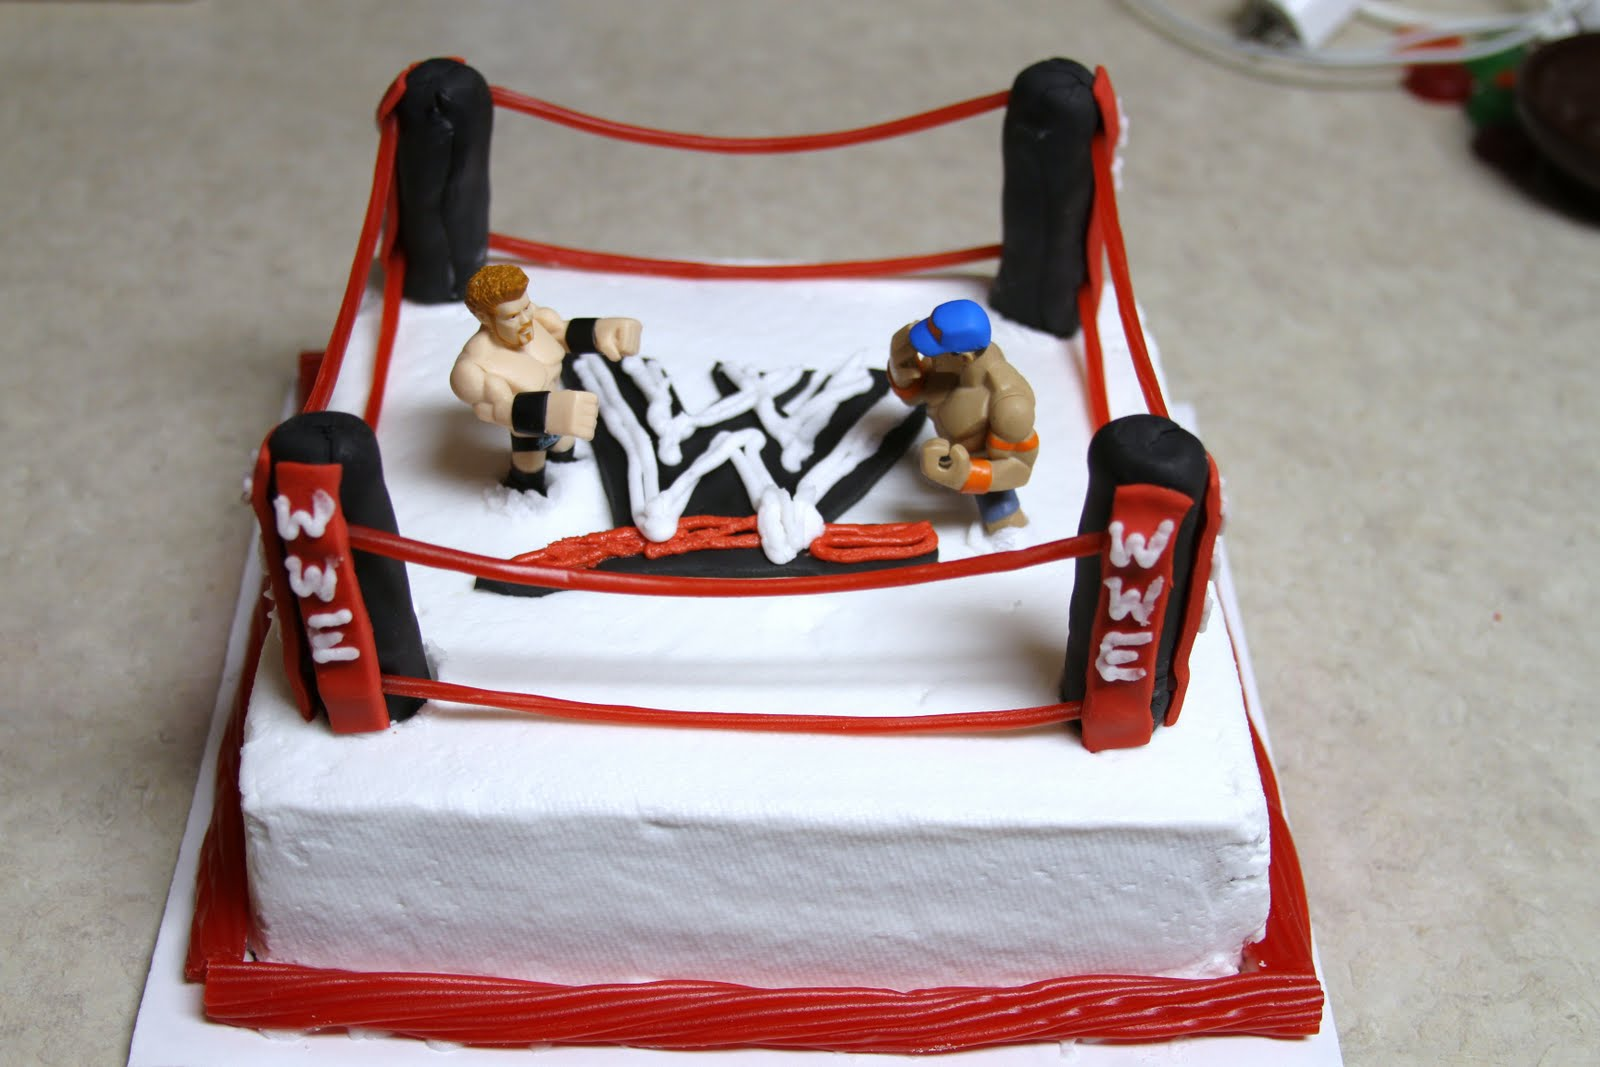 7 Wwe Bday Cakes Photo Wwe Wrestling Birthday Cake Ideas Wwe